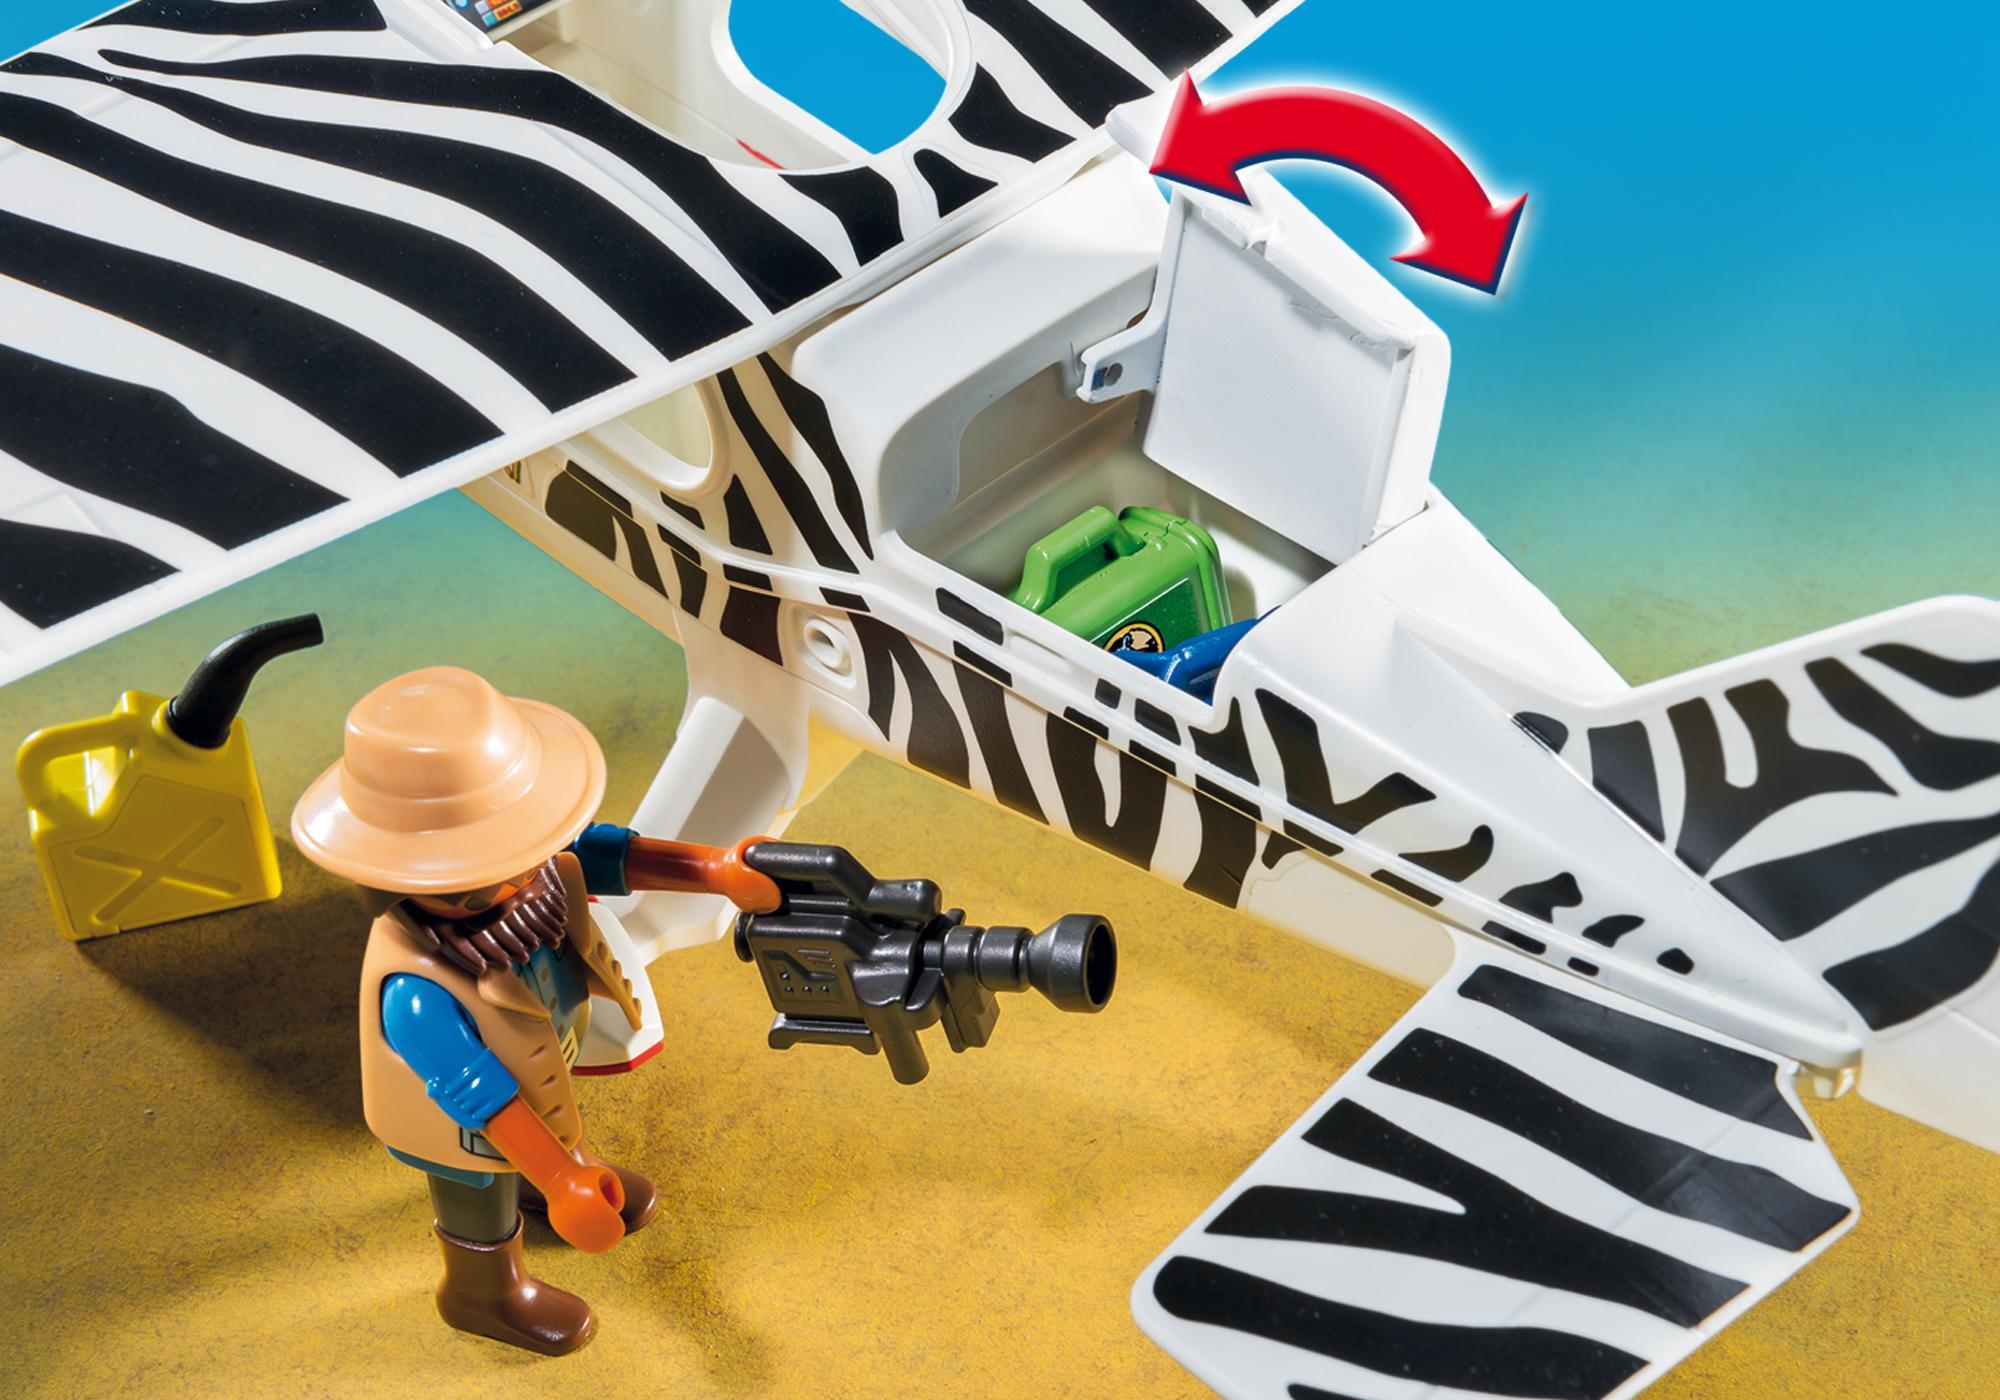 http://media.playmobil.com/i/playmobil/6938_product_extra1/Aereo di avvistamento fly-safari